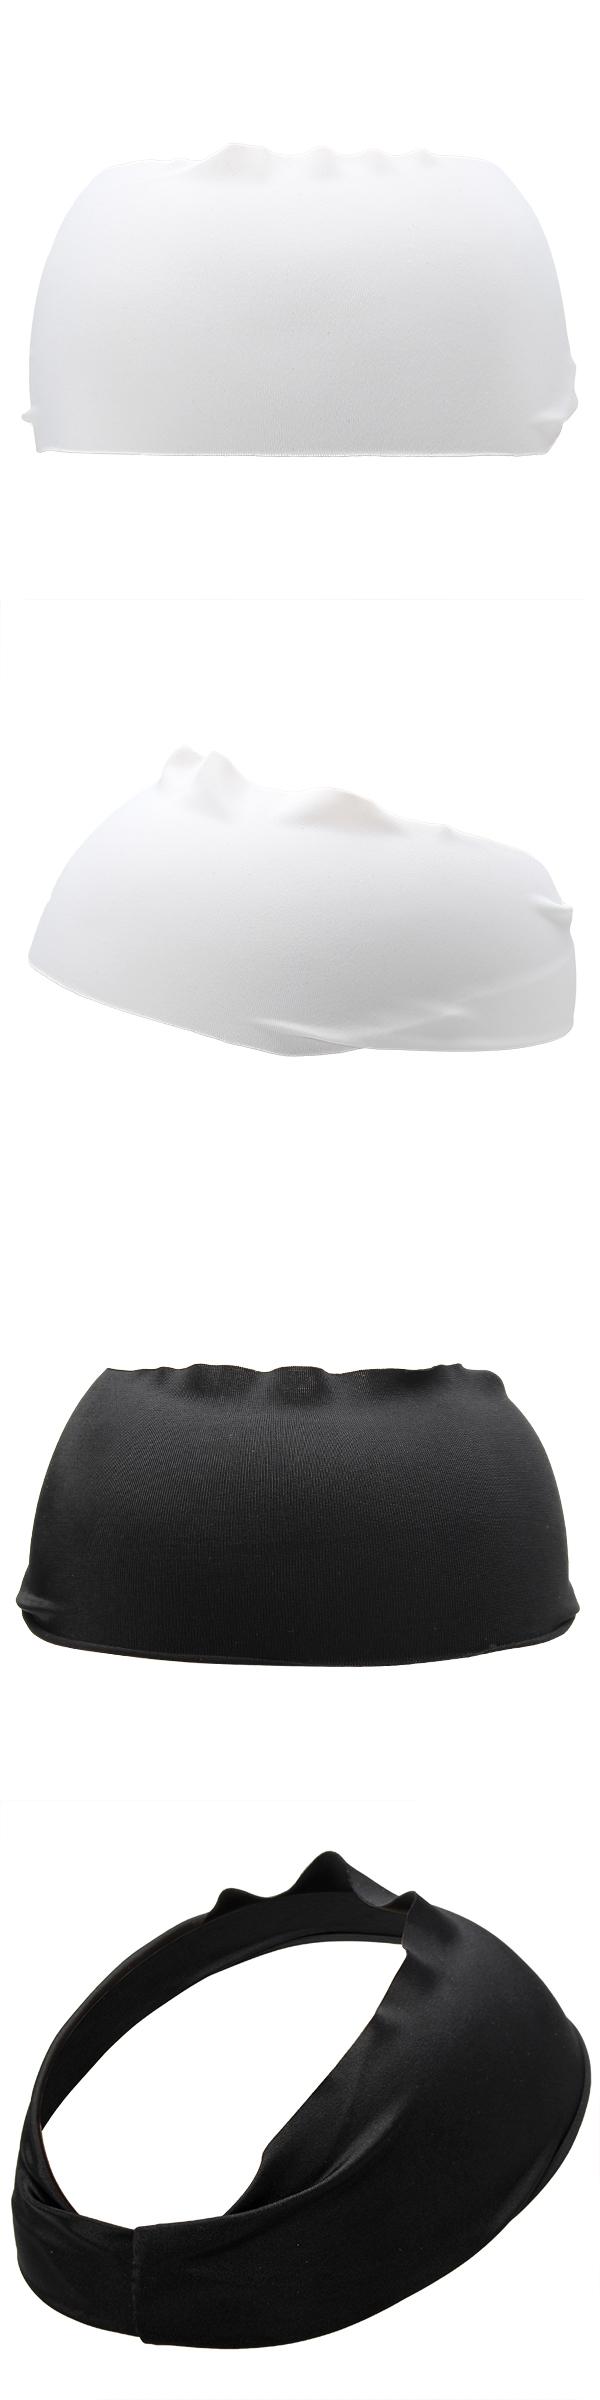 Women Sport Printed Headbrand Casual Fashion Multi Pattern Running Workout Headwear